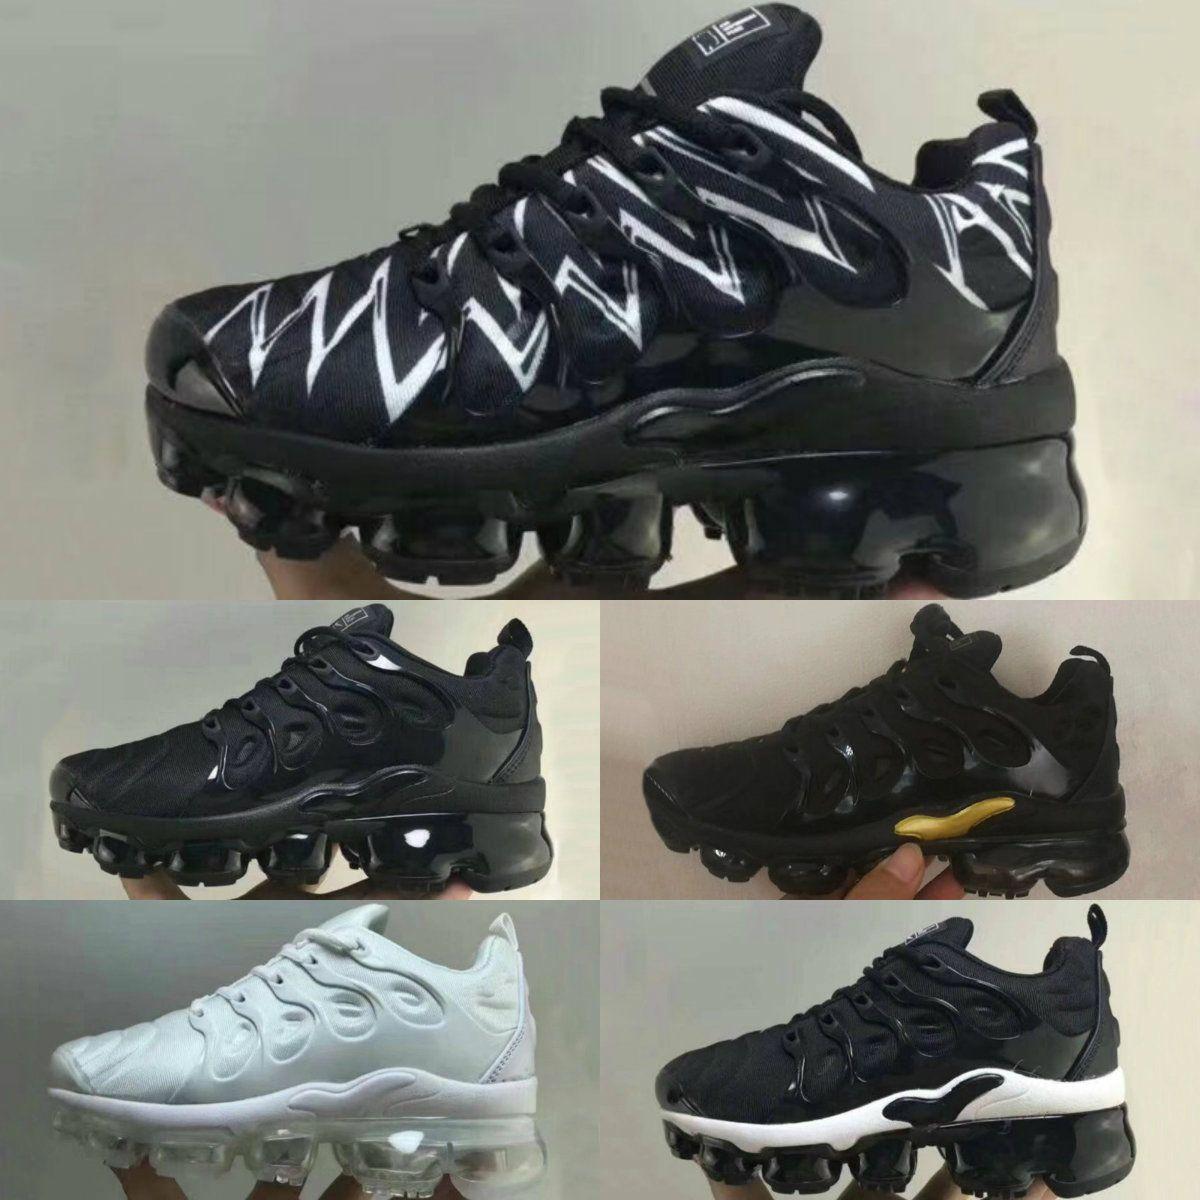 VM New TN Noir Plus Blanc Acheter 2018 Enfants Vapor Chaussures 4RAj35Lq